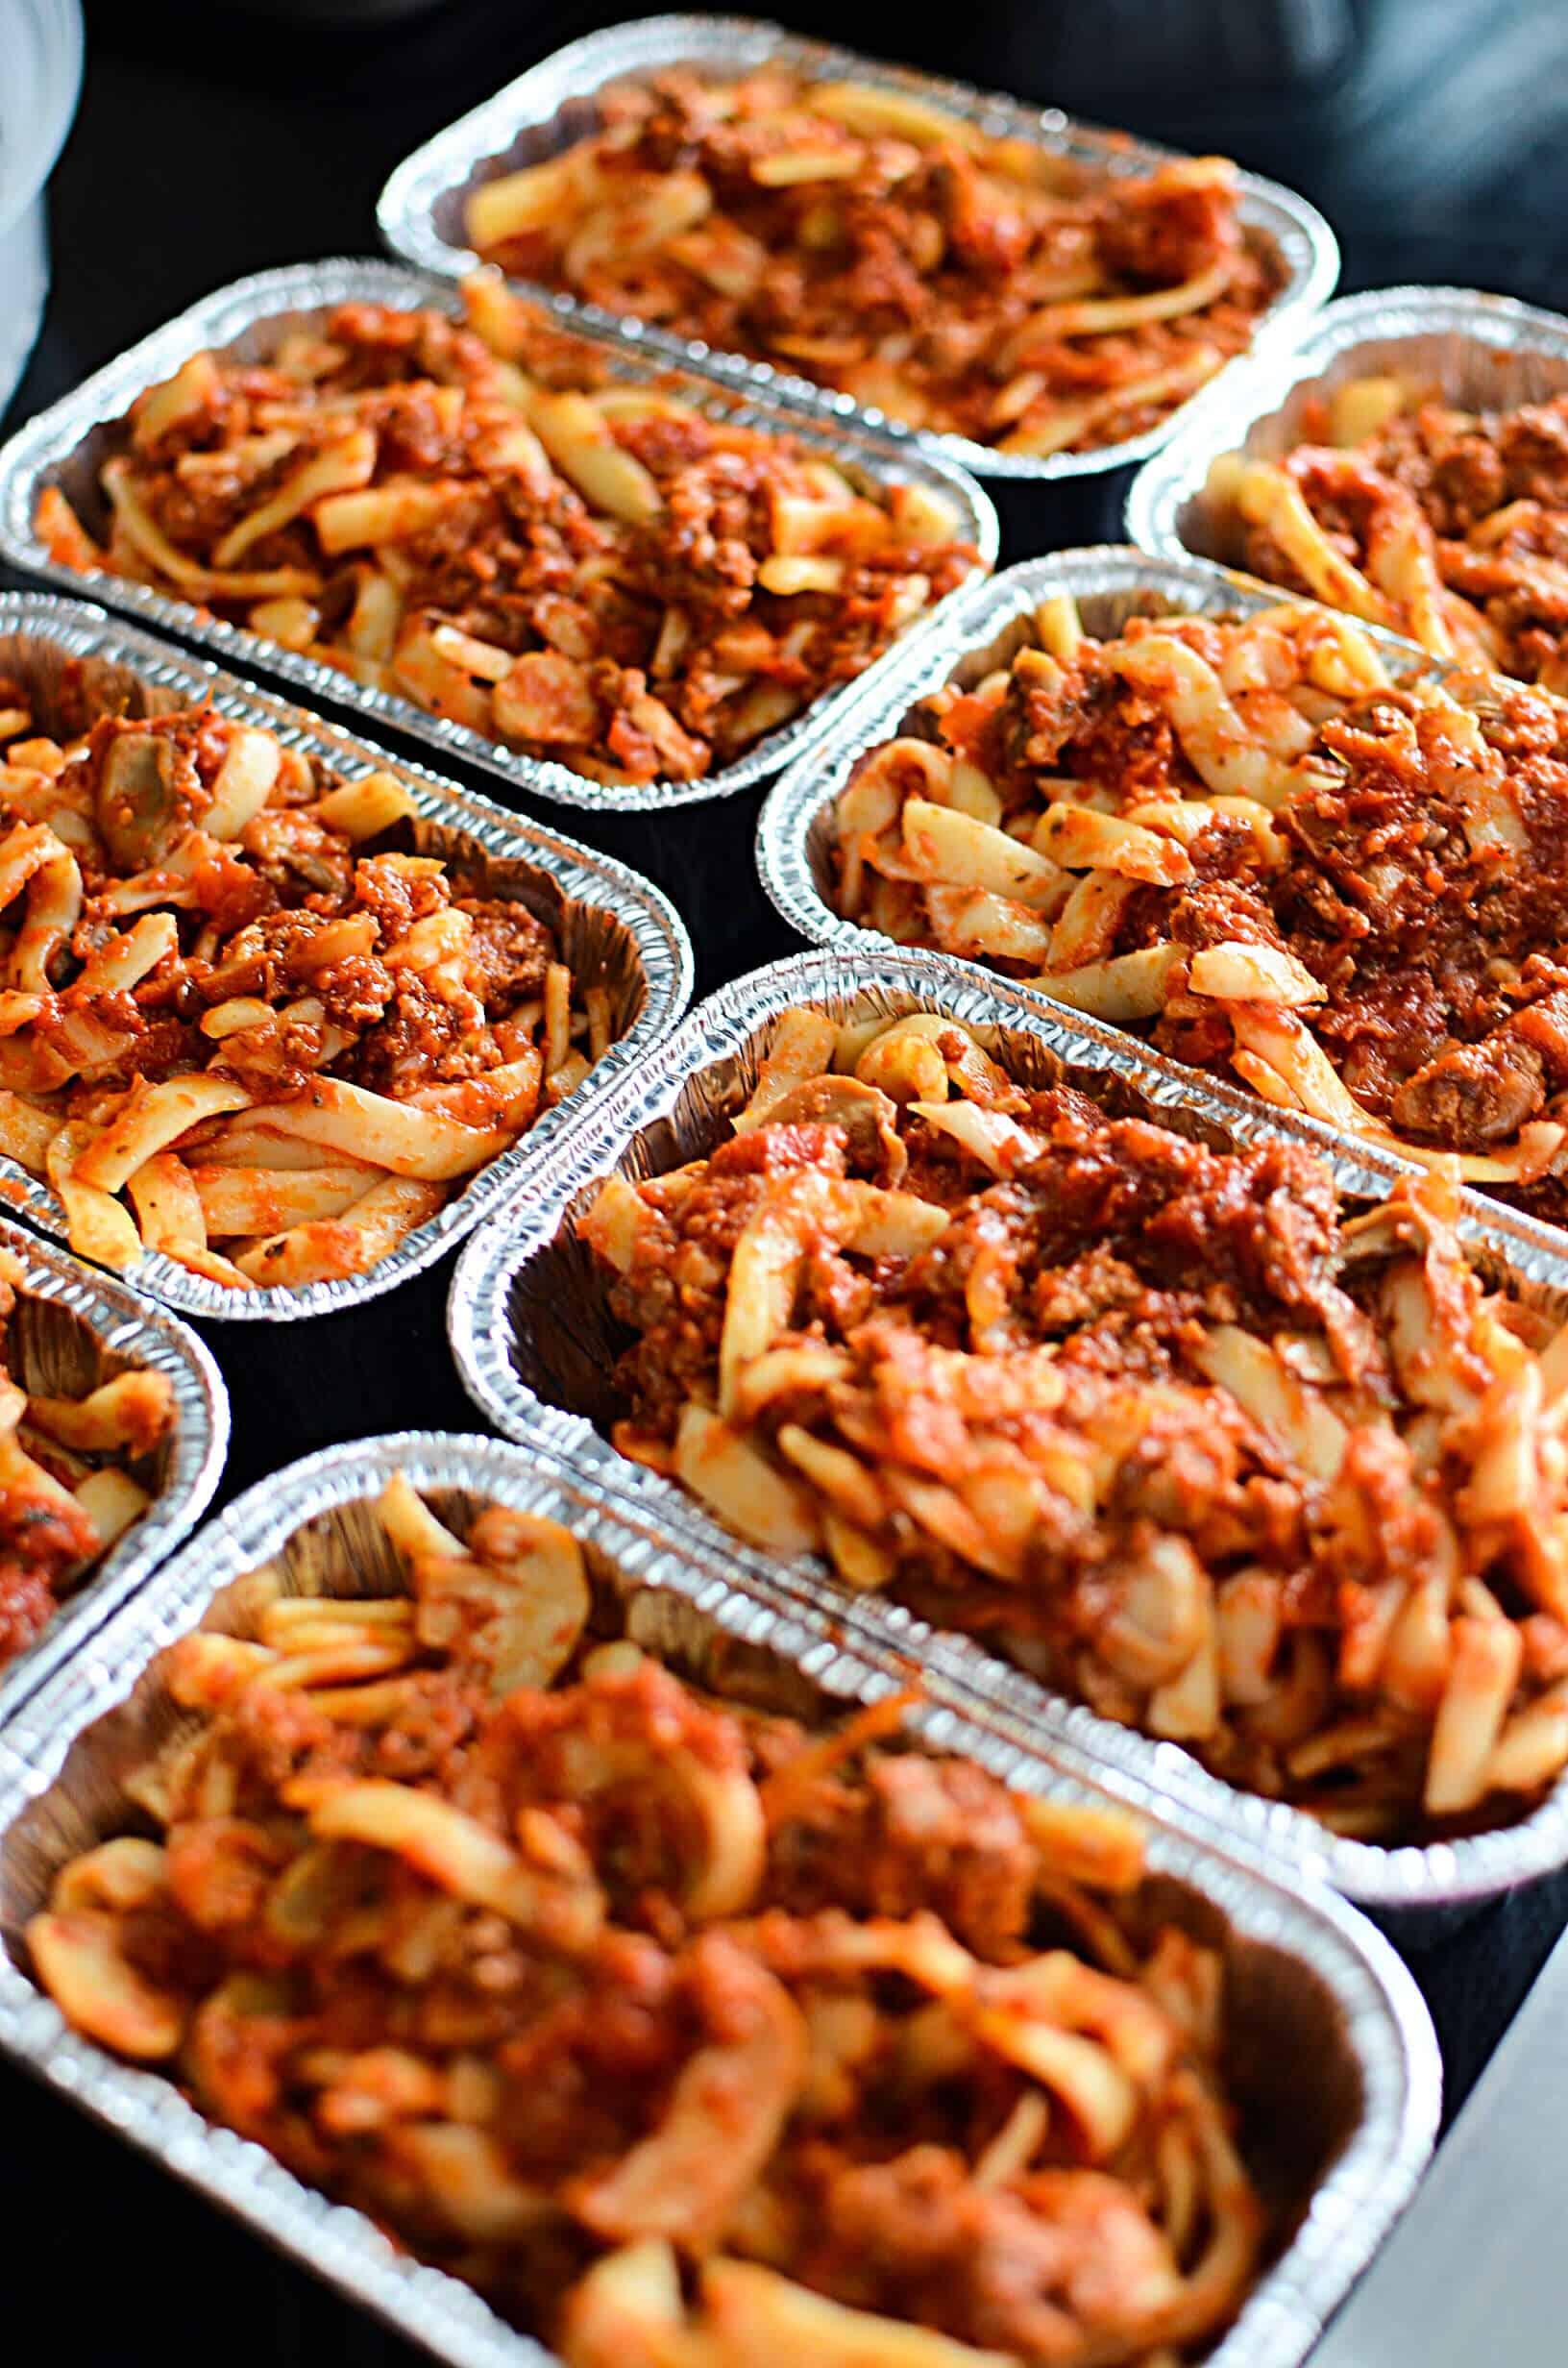 Make Ahead Meals Individually Baked